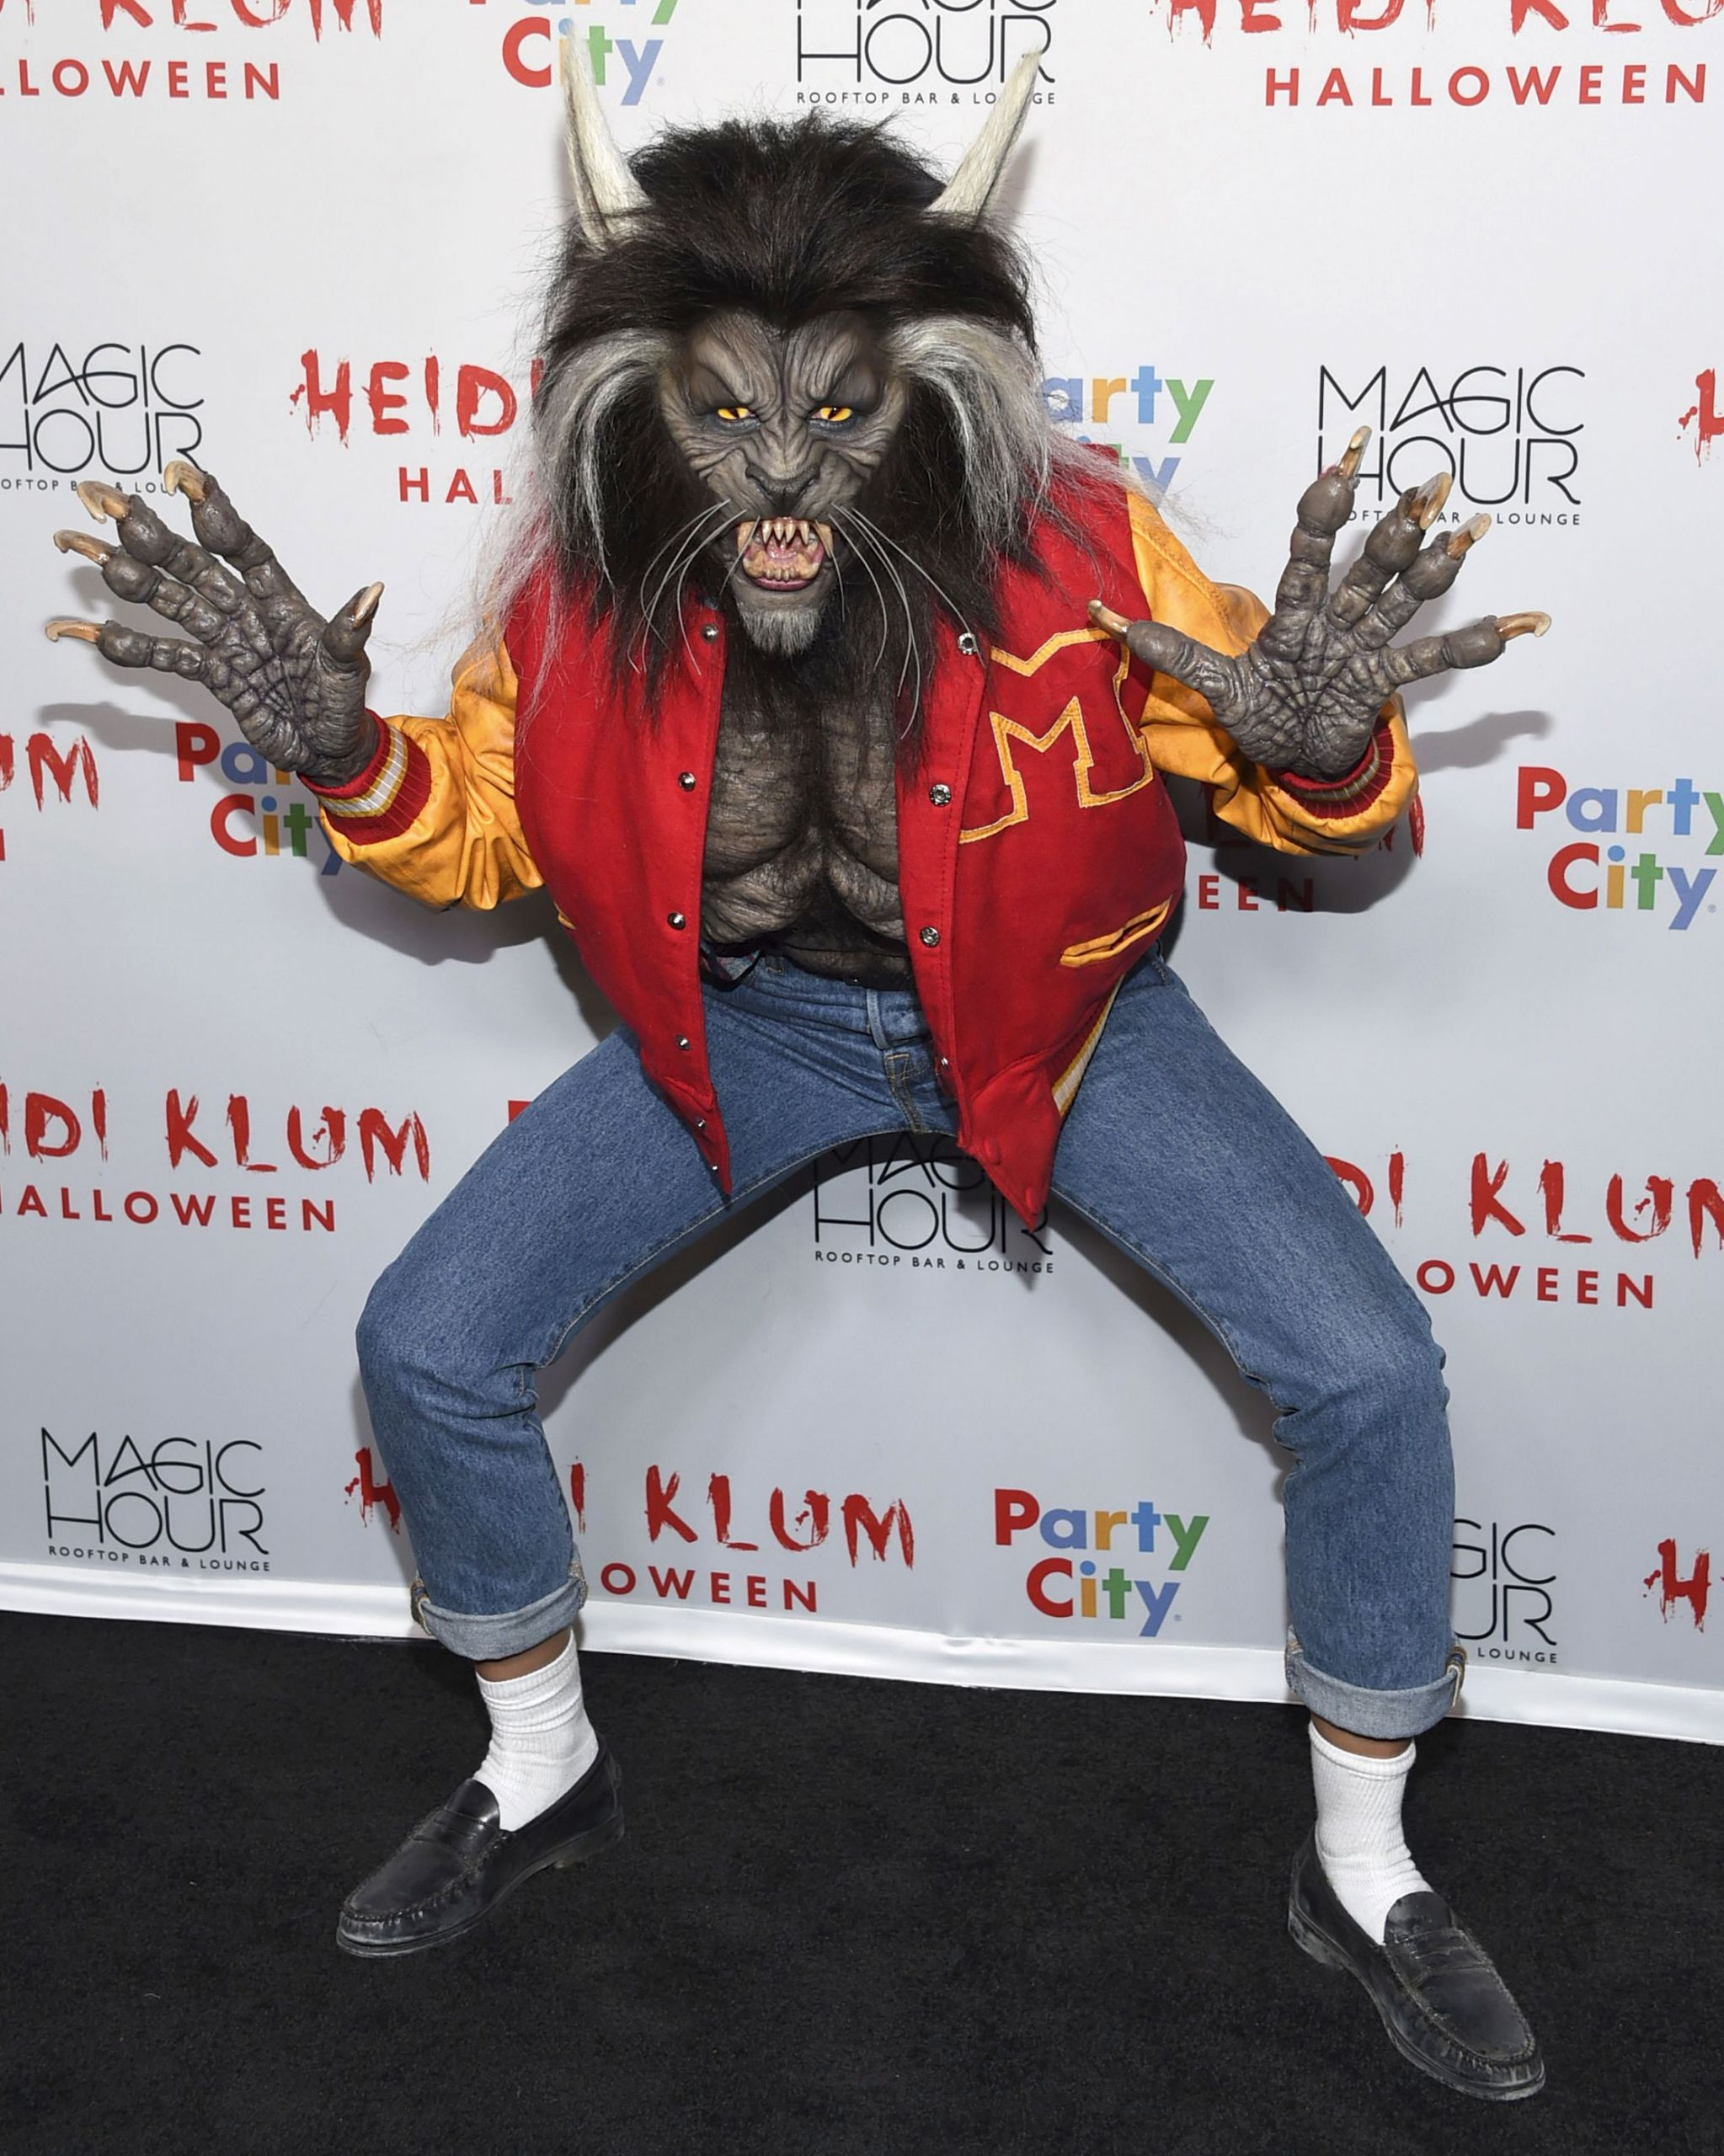 heidi klum halloween party costumes